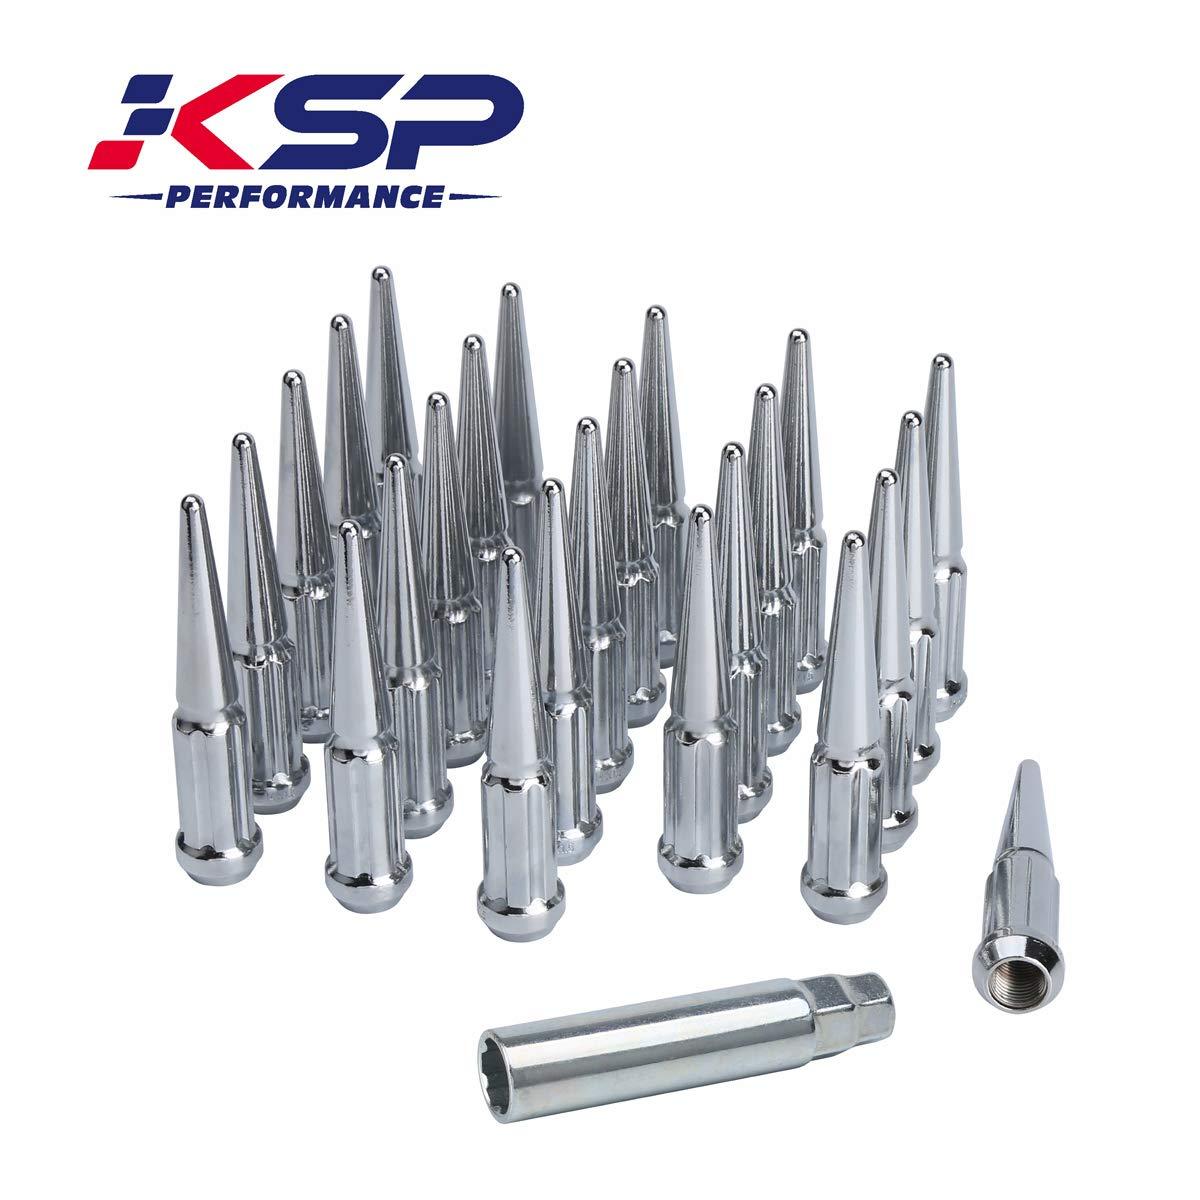 KSP 24 Pc 6 Spline Spike Lug Nuts M14x1.5 Thread 4.4'' Tall Closed End Bulge Acorn Spike Lug Nut and 1 Long Socket Key for Aftermarket Wheels Chrome